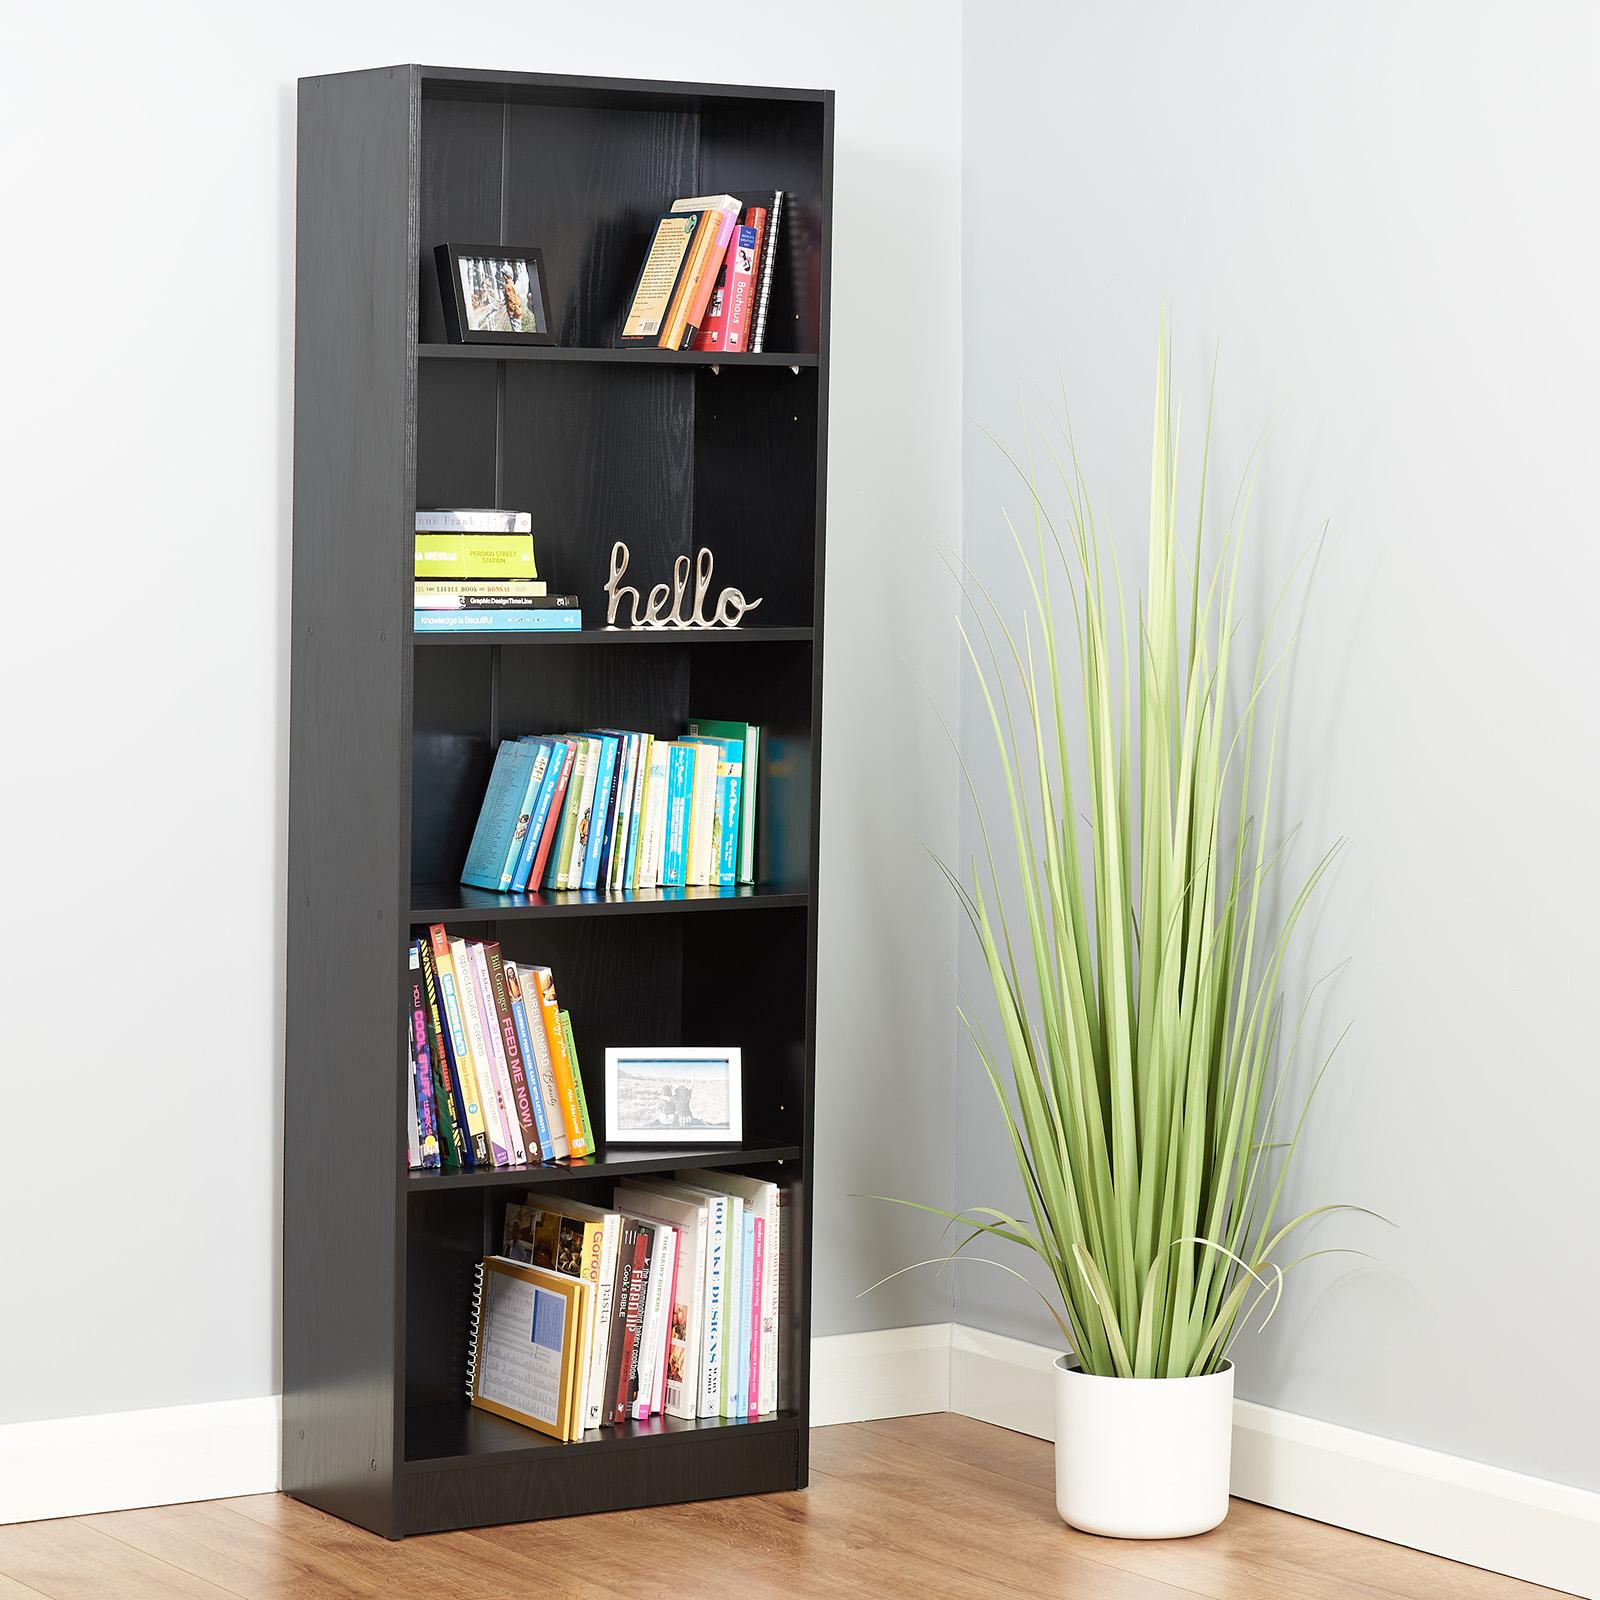 HARTLEYS 5 TIER TALL BLACK WOODEN FREESTANDING BOOKCASE STORAGE UNIT DEEP SHELF